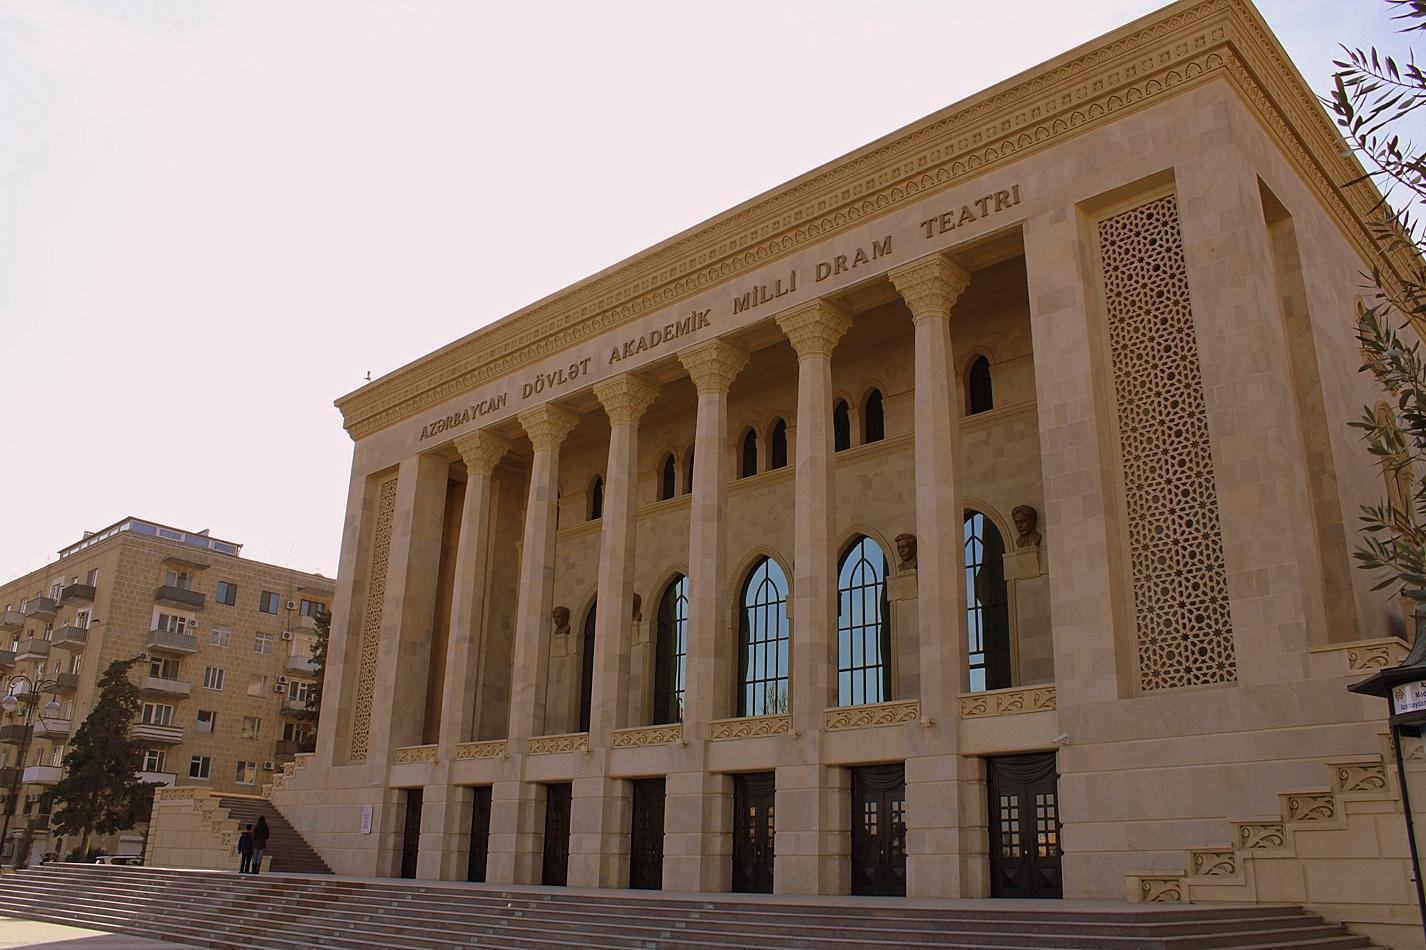 Азербайджанский драматический театр, Баку